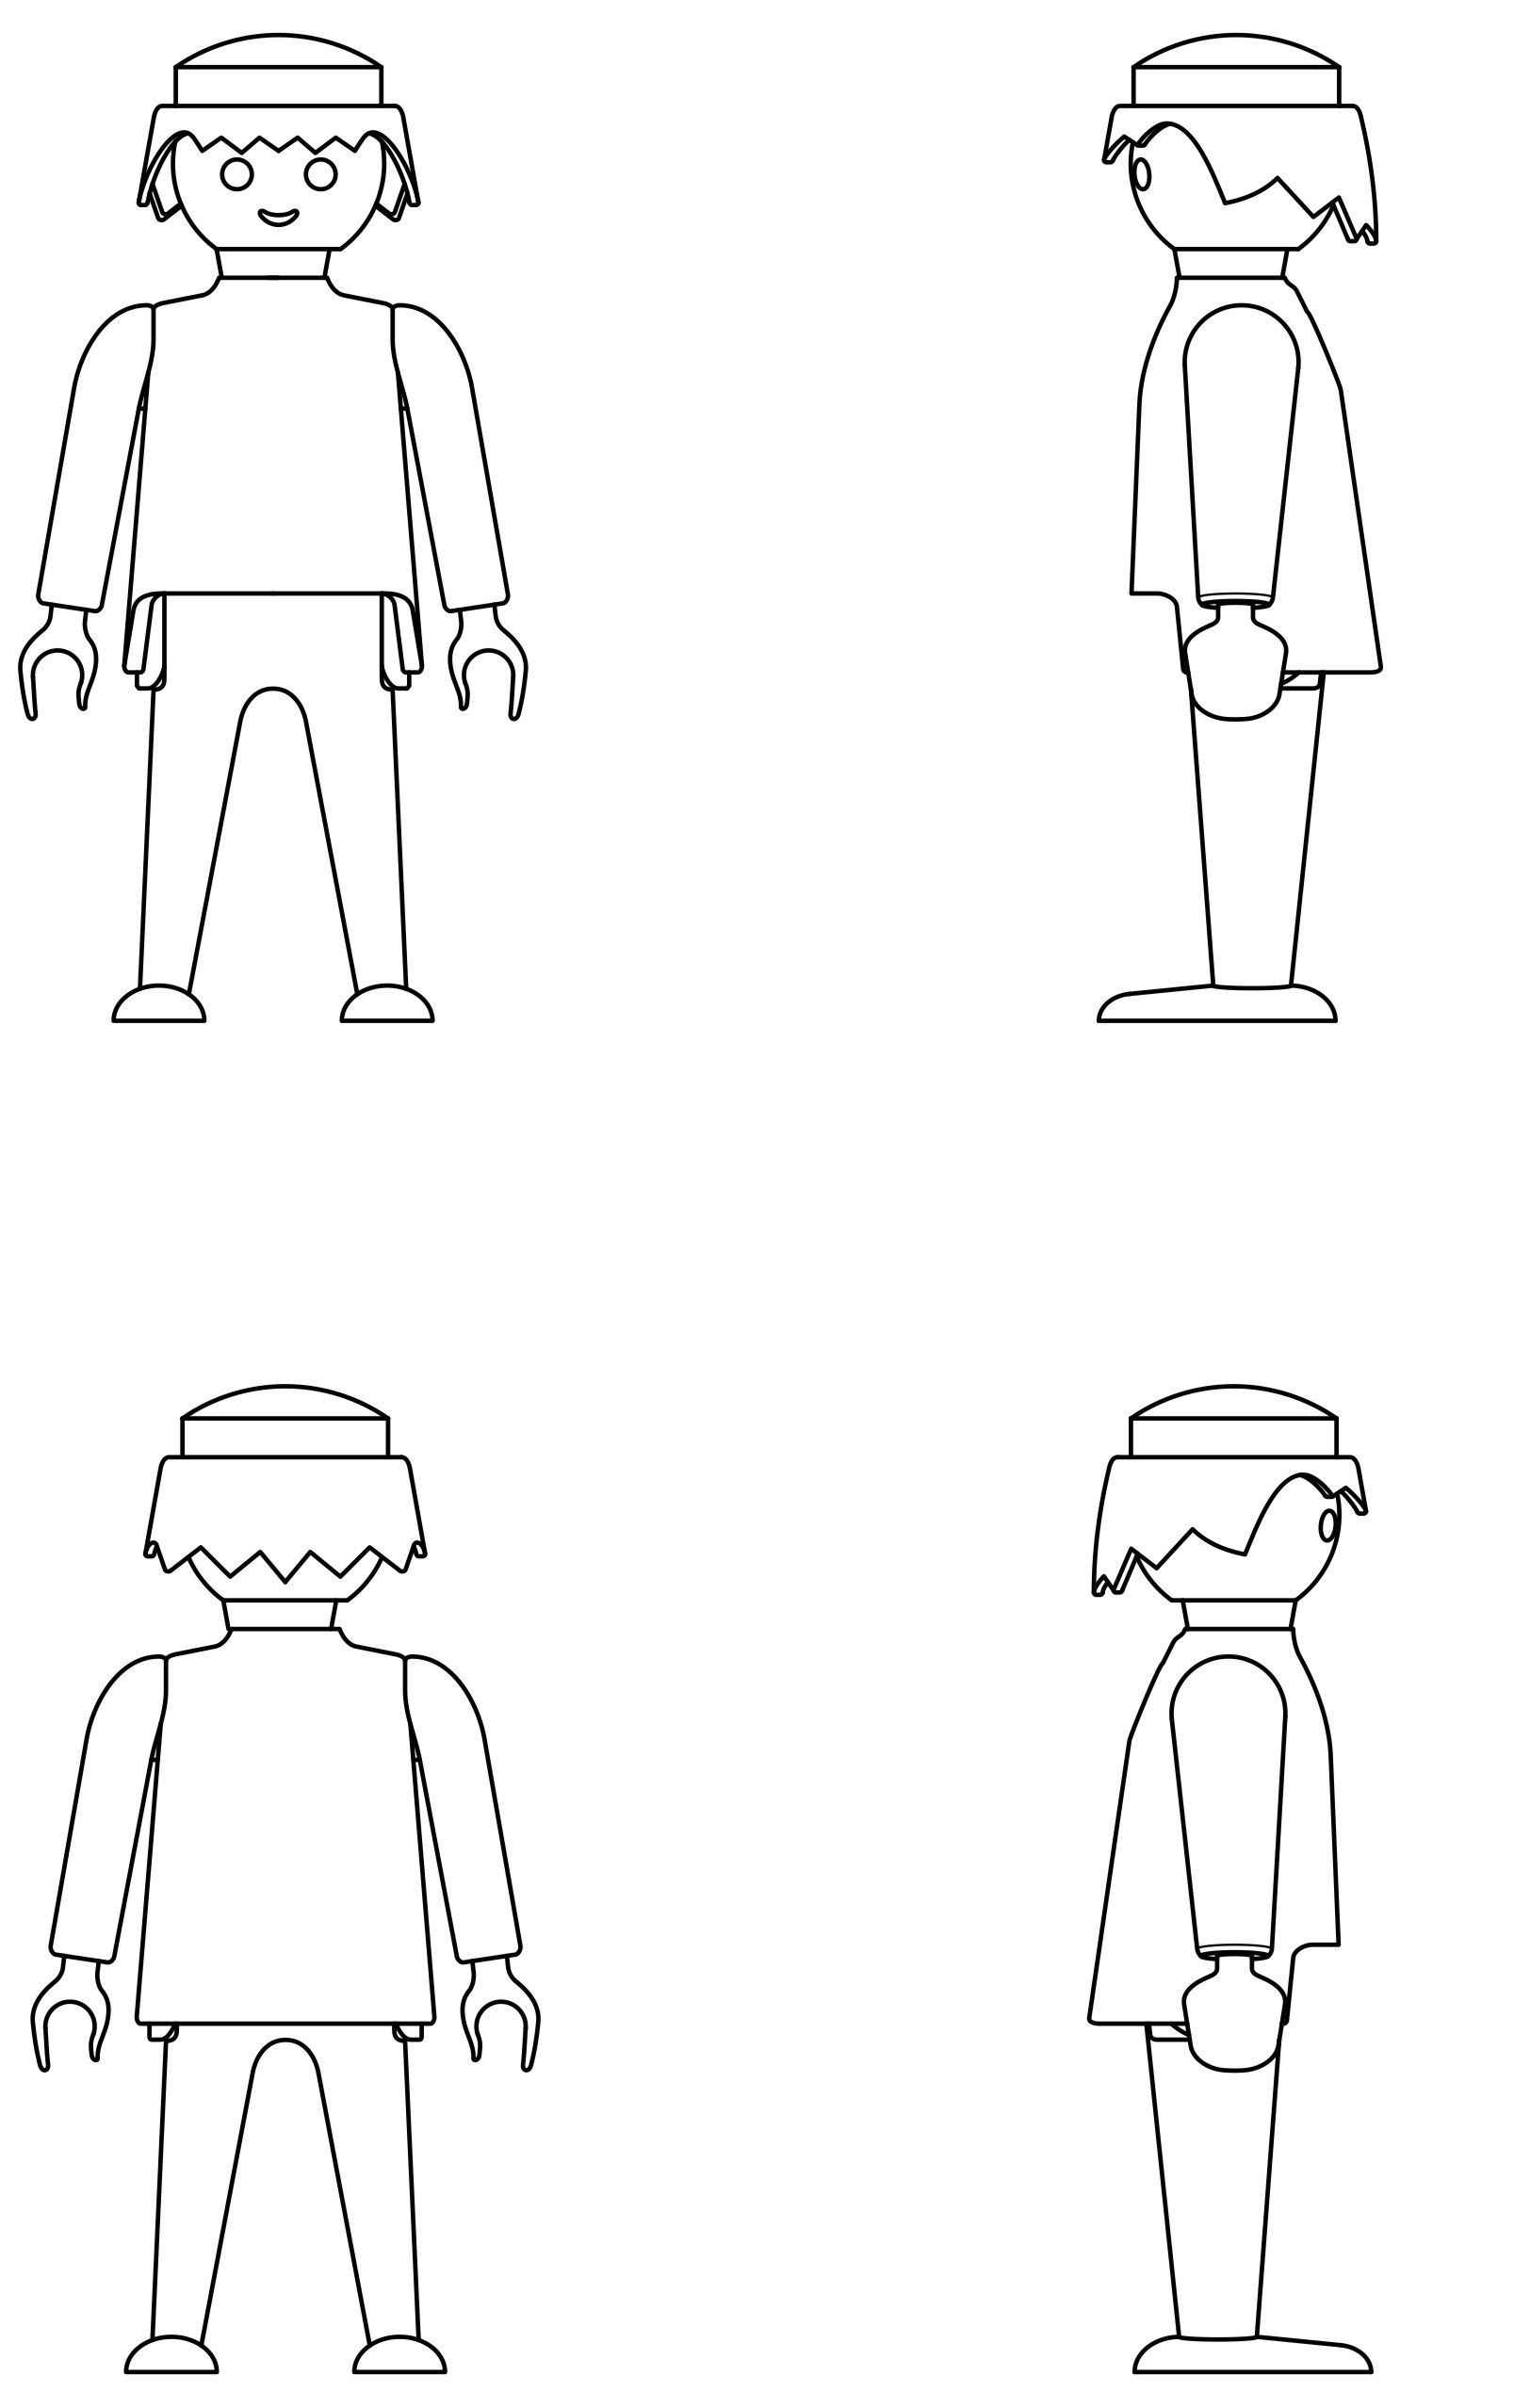 Ausmalbilder Playmobil Figuren : Apliqu Playmobil Playmobil Pinterest Playmobil Silhouettes